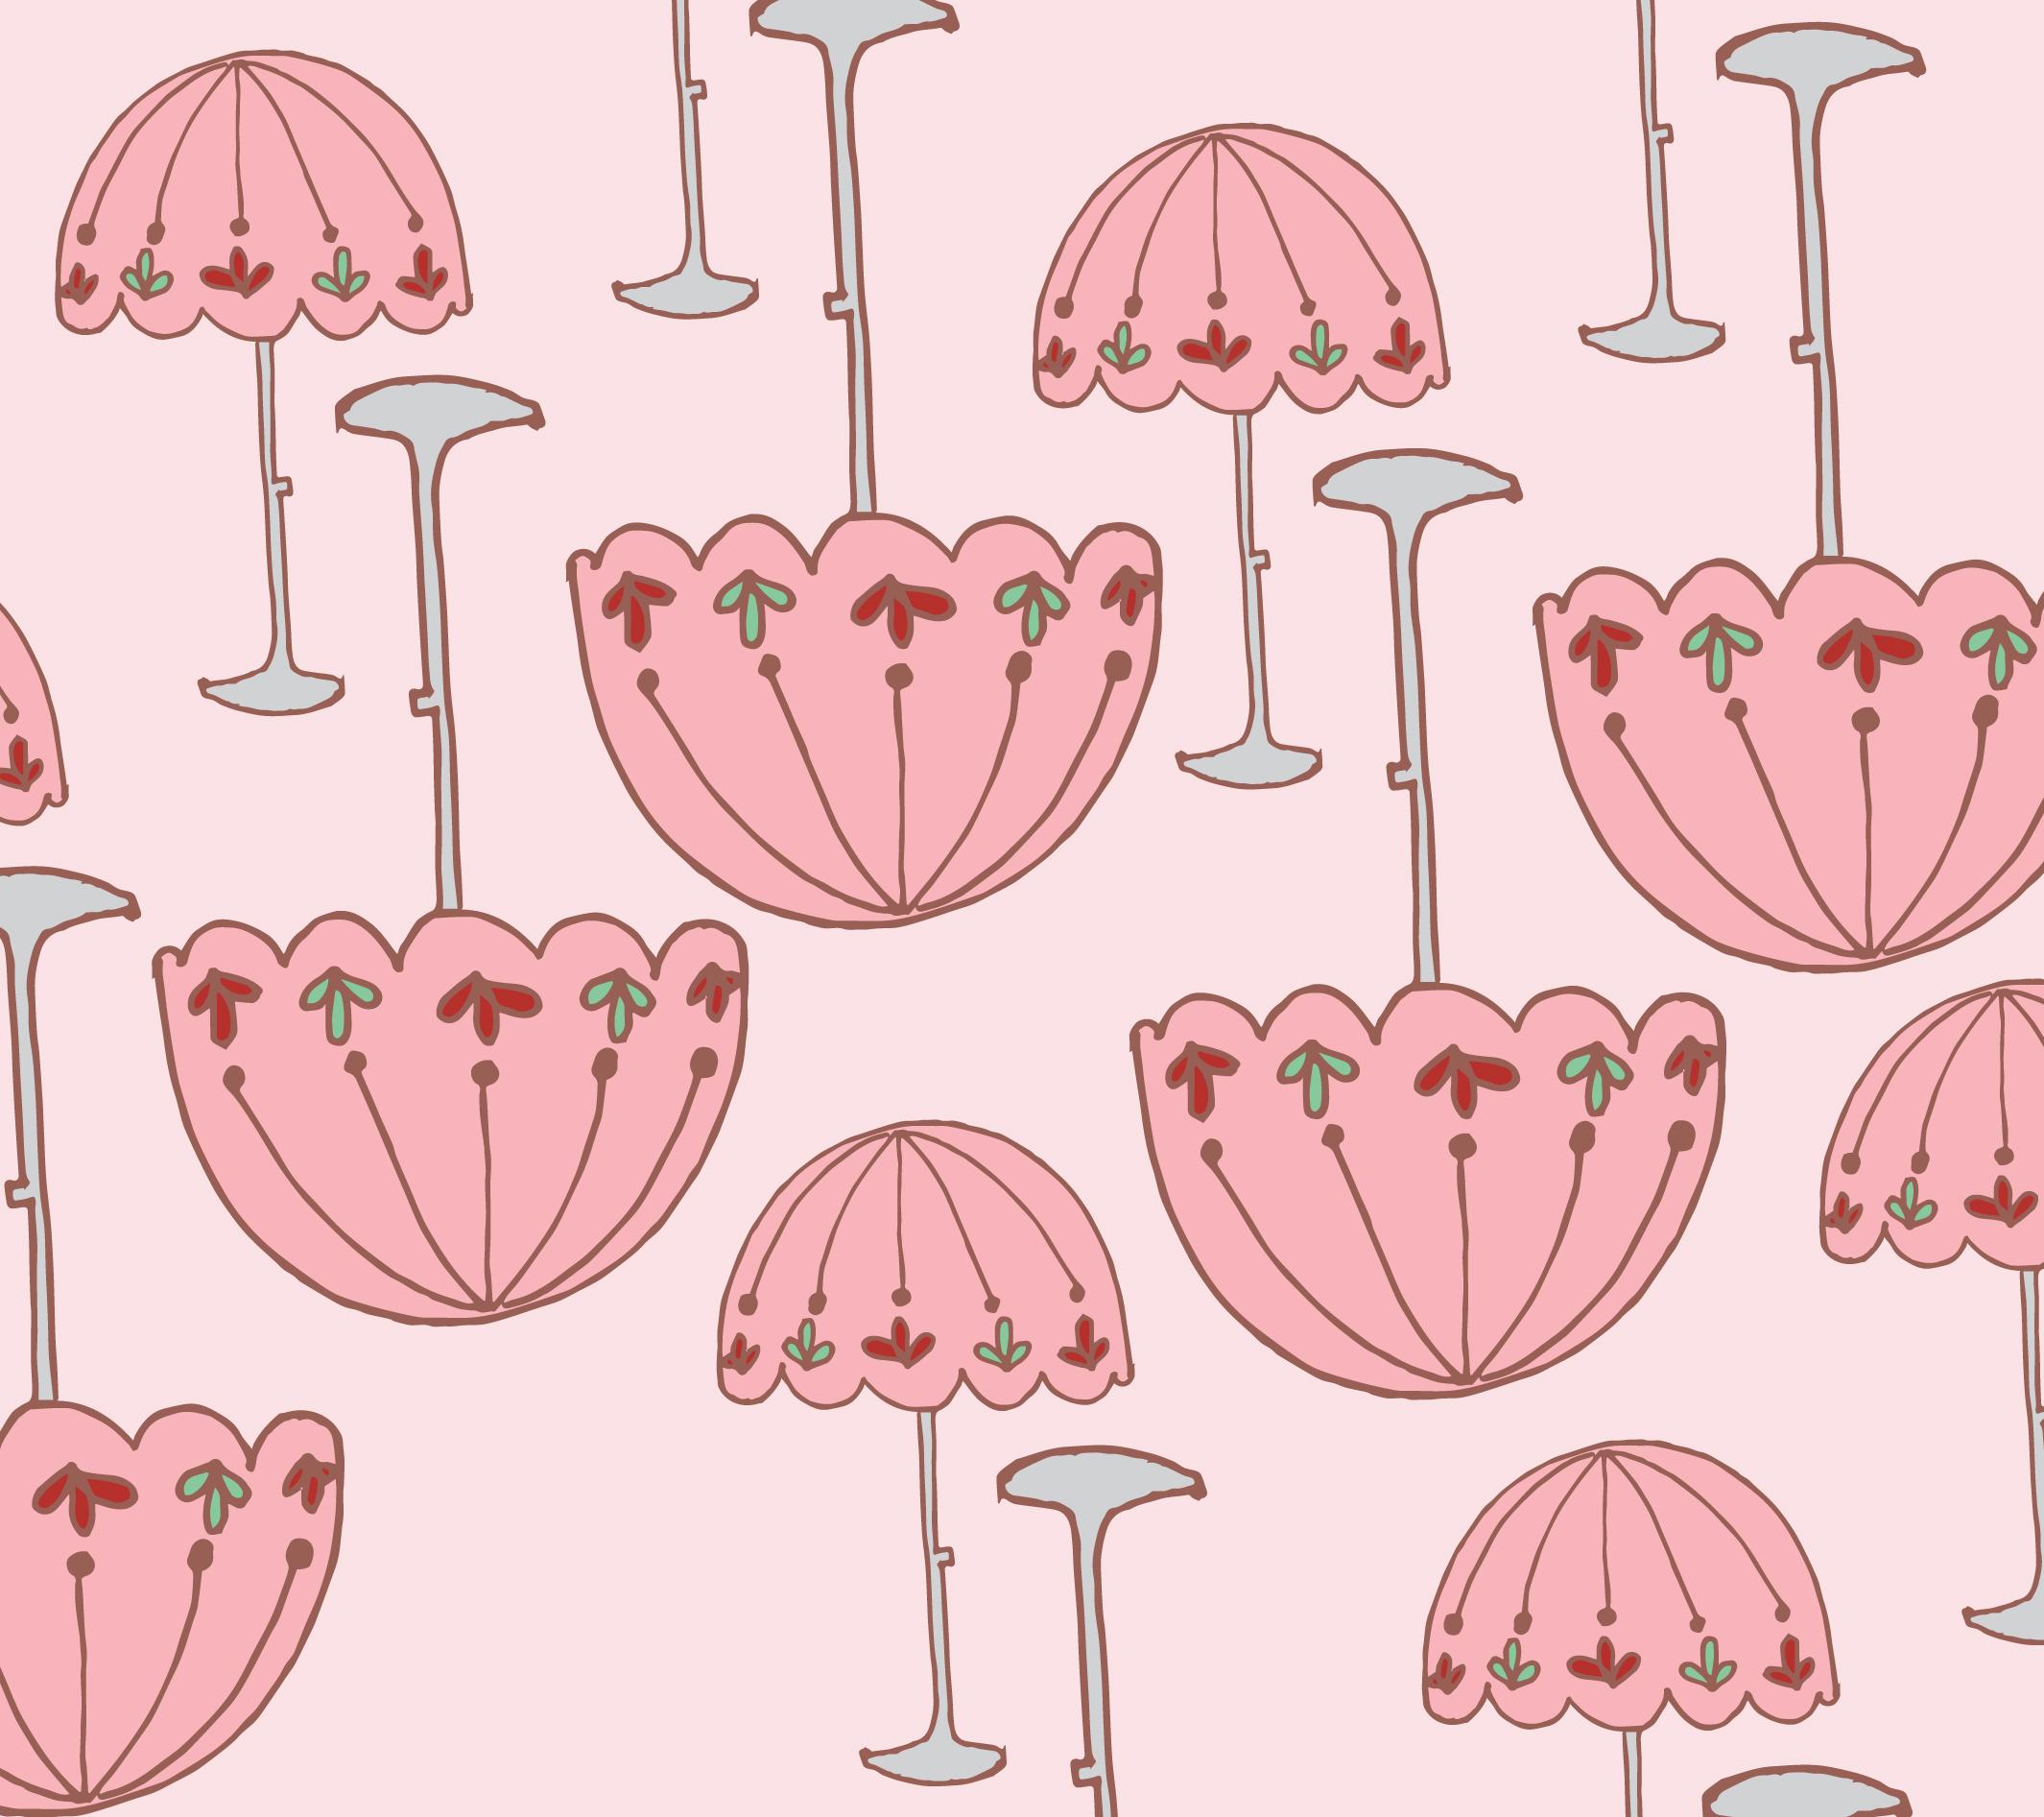 BB_Camping_Girls_Umbrella_Coord.jpg